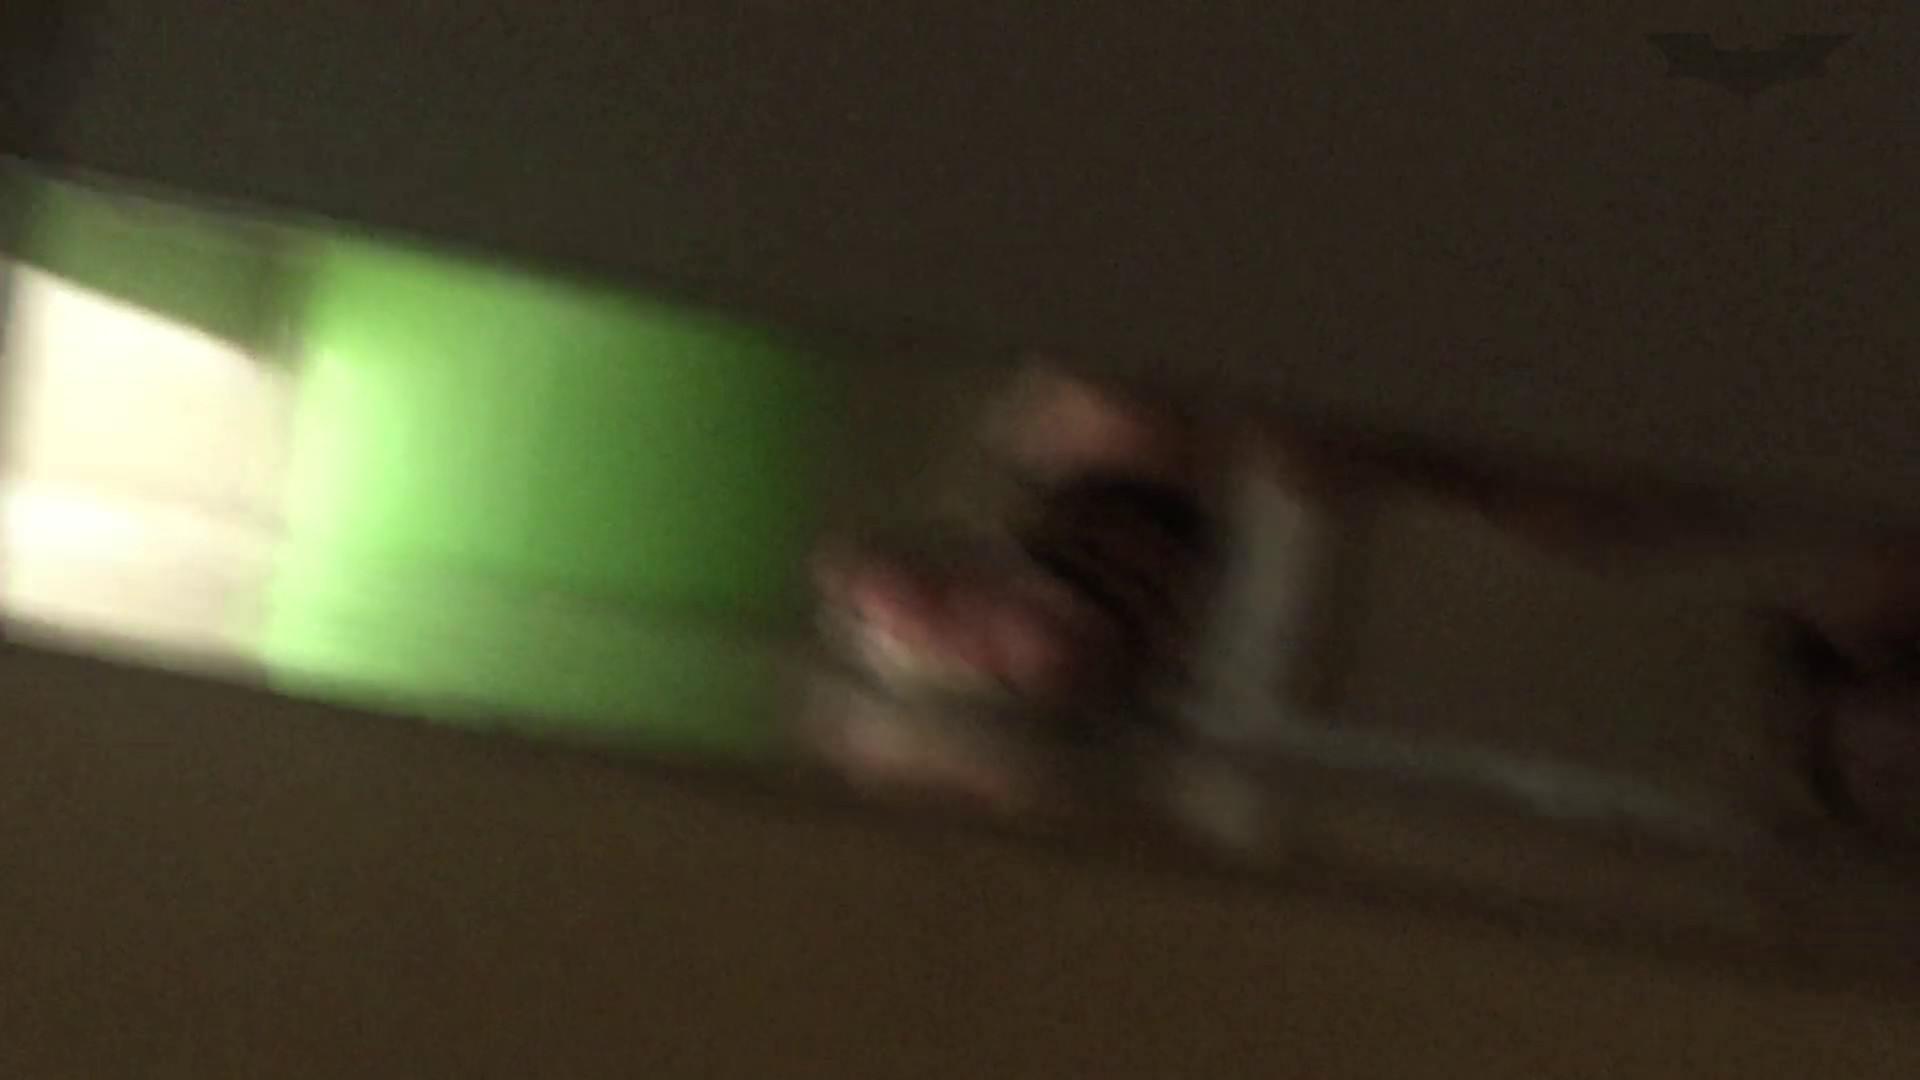 JD盗撮 美女の洗面所の秘密 Vol.73 エッチすぎるOL達 オマンコ動画キャプチャ 67連発 52